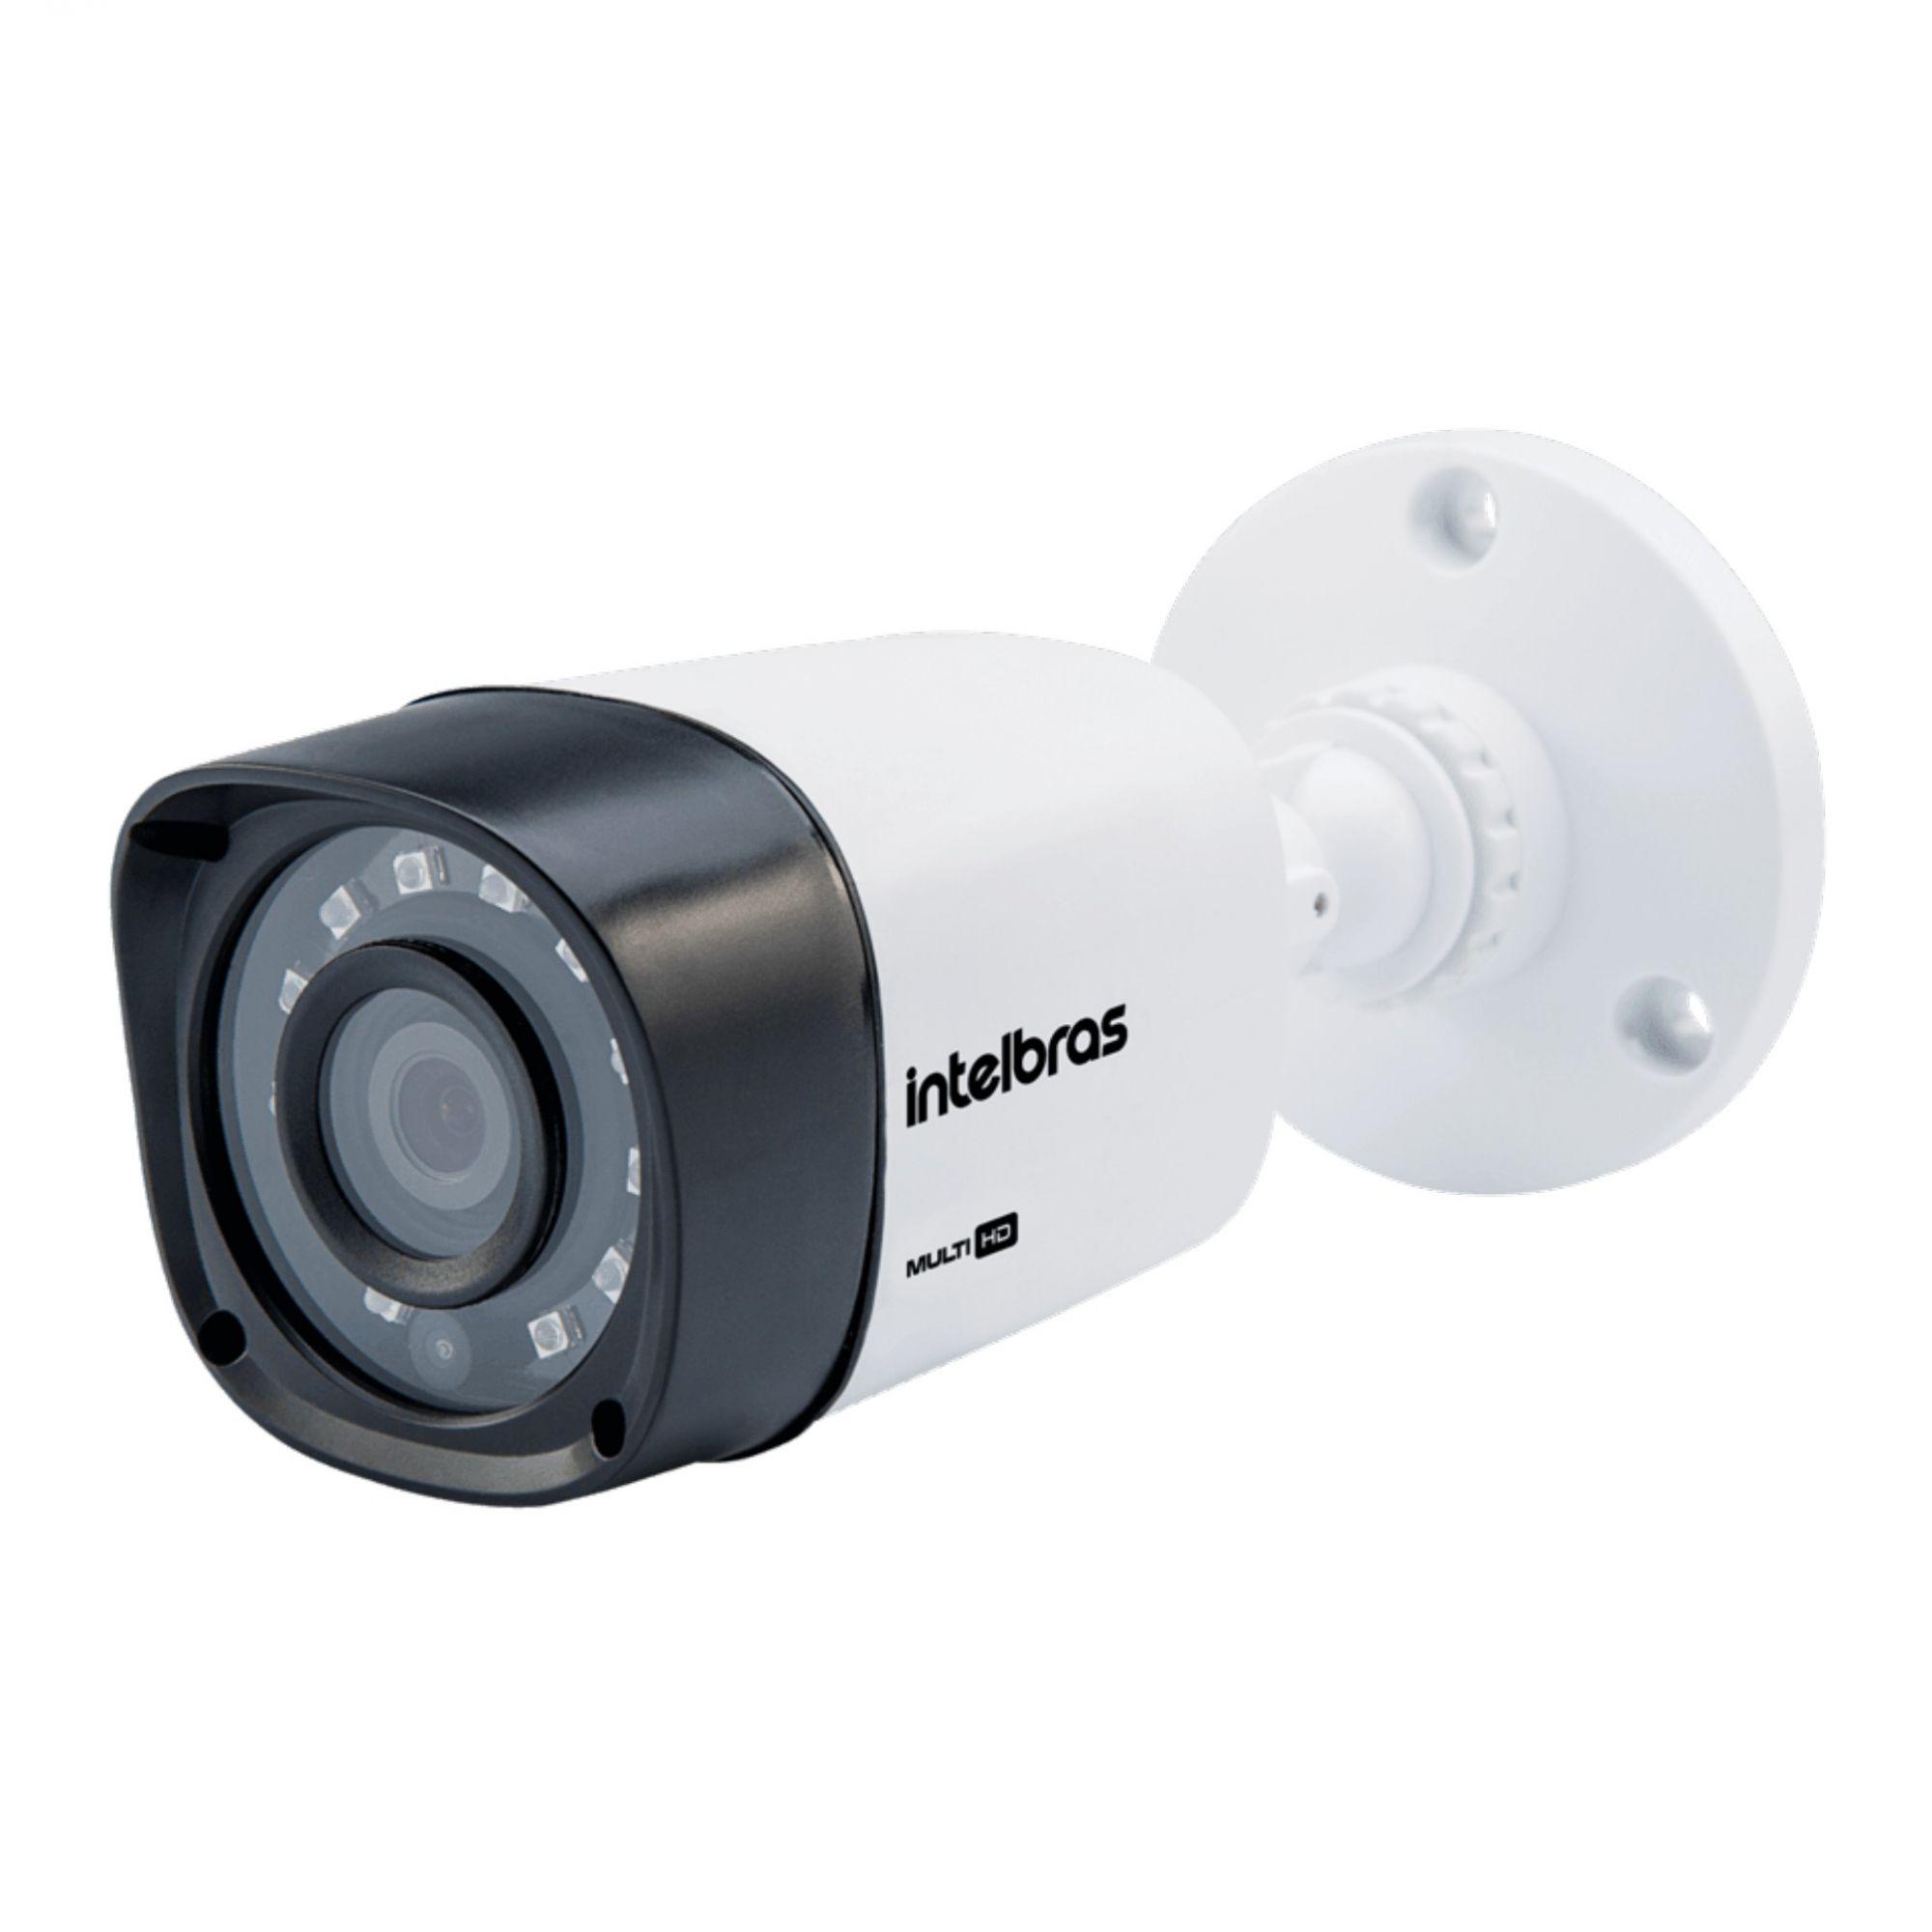 Kit CFTV Intelbras Completo 6 Câmeras AHD 720p DVR 8 Canais